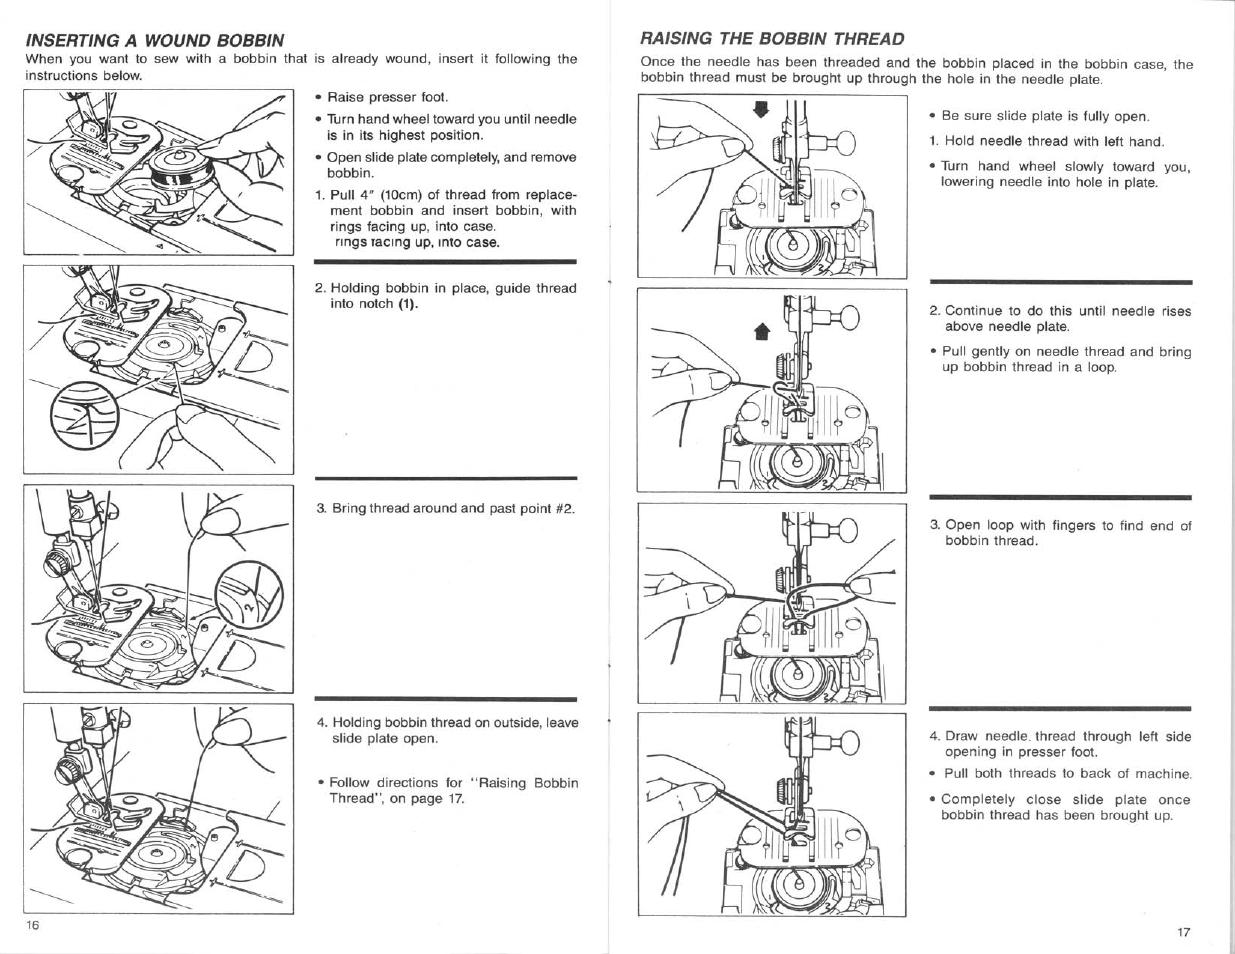 Inserting A Wound Bobbin